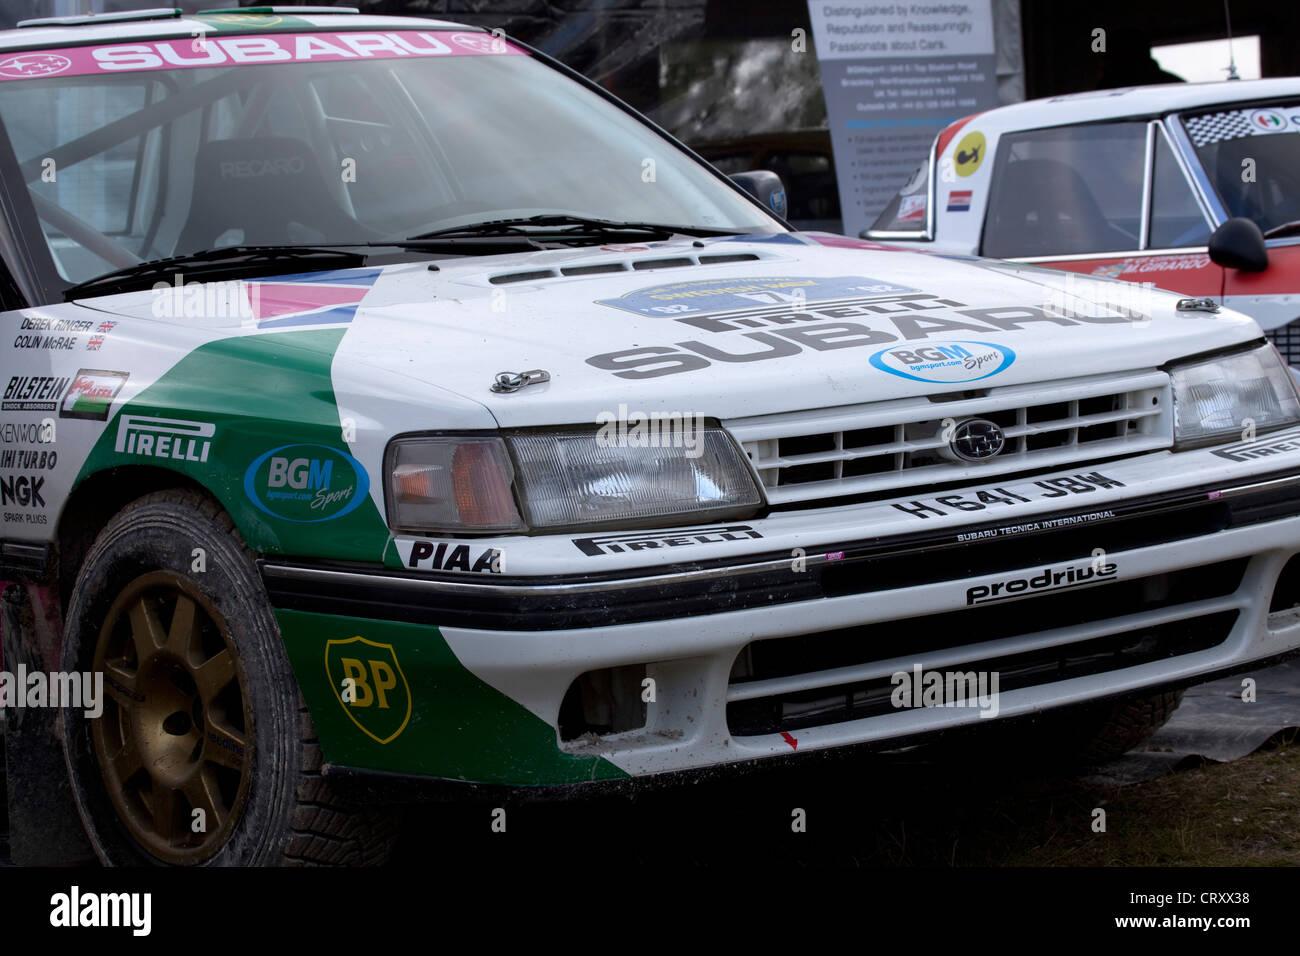 subaru legacy rally car 1990 was drivencolin mcrae stock photo